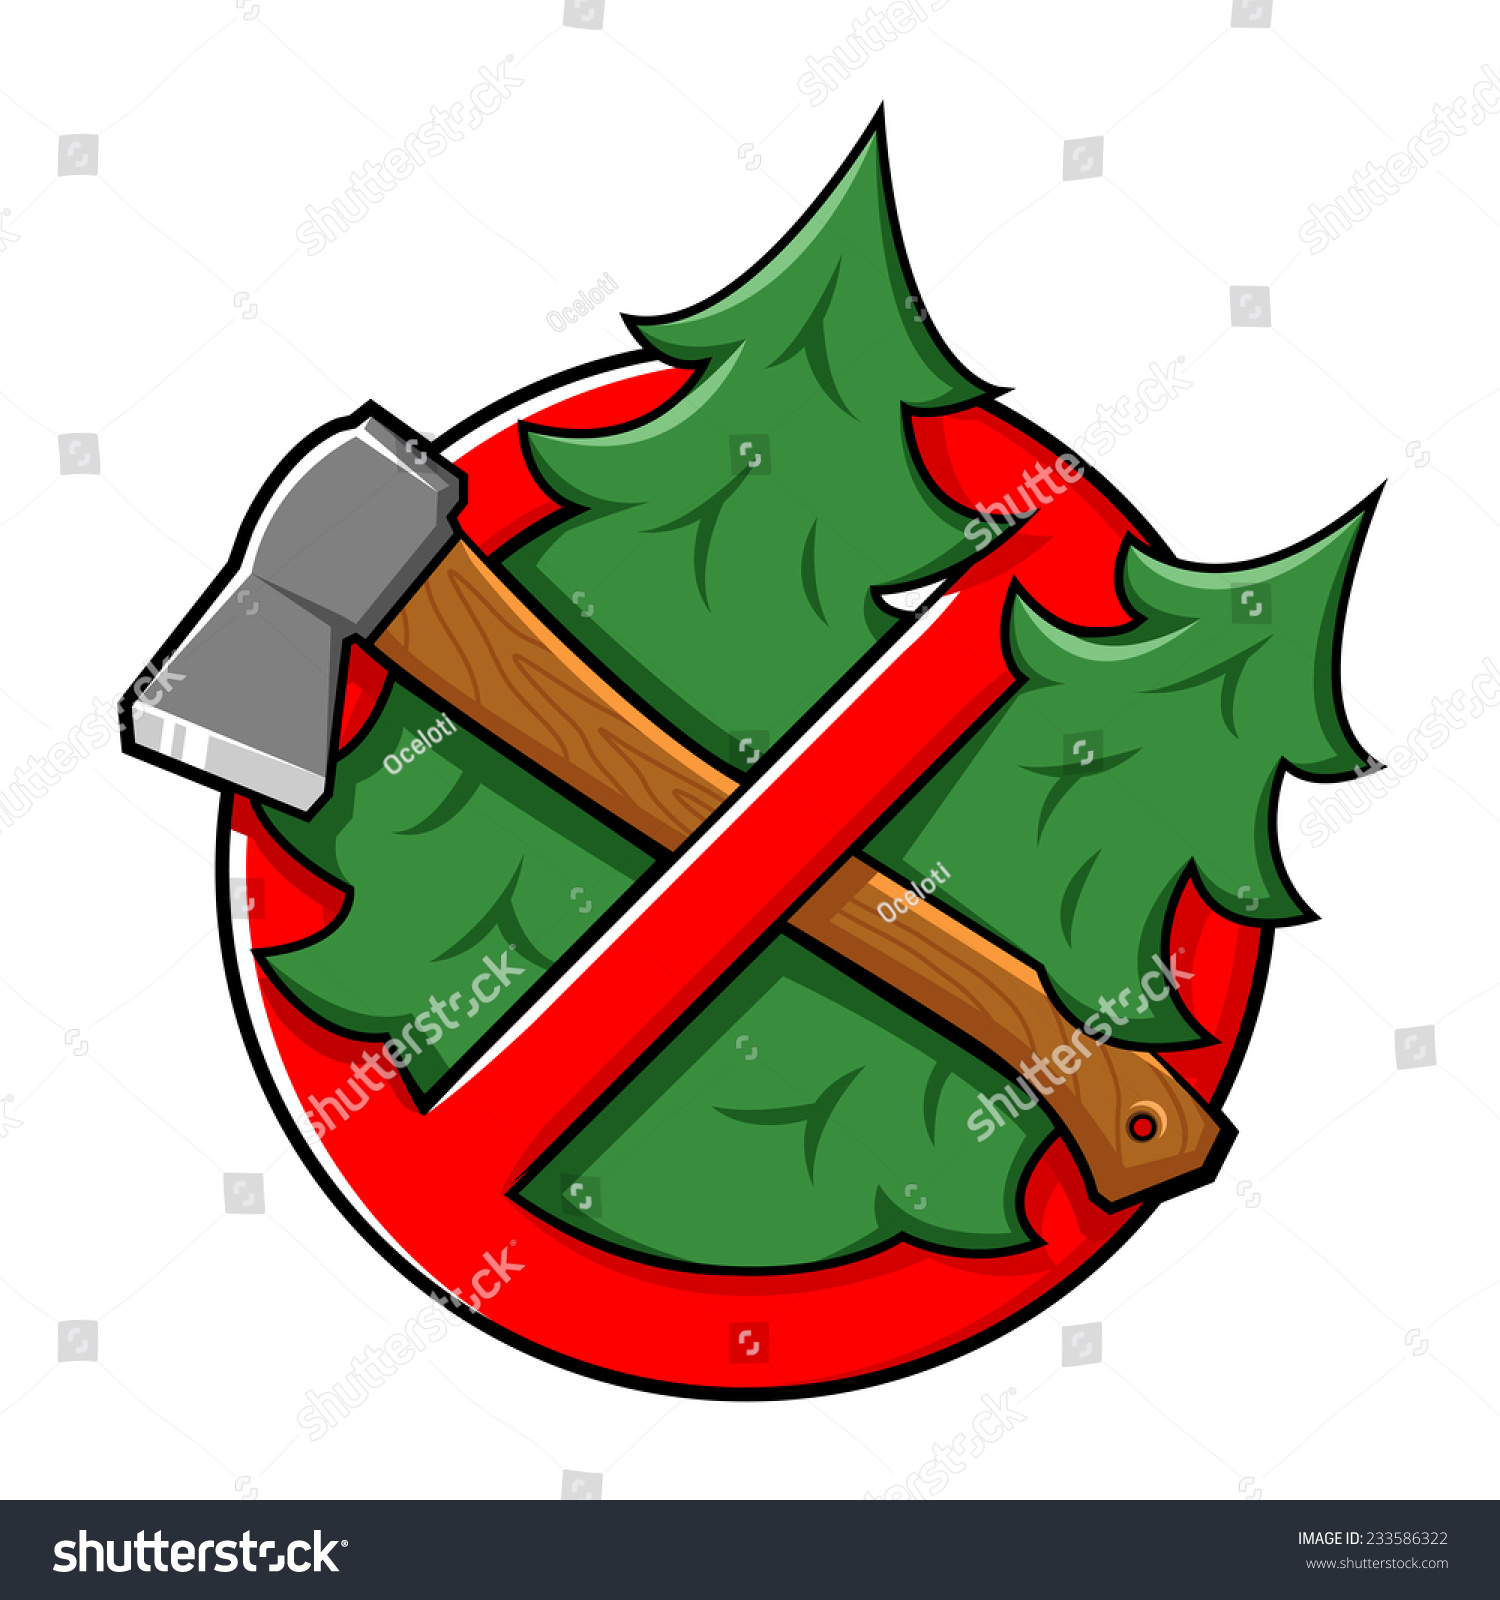 Red Warning Cartoon Sign, Do Not Cut Tree, Stop Cutting ...